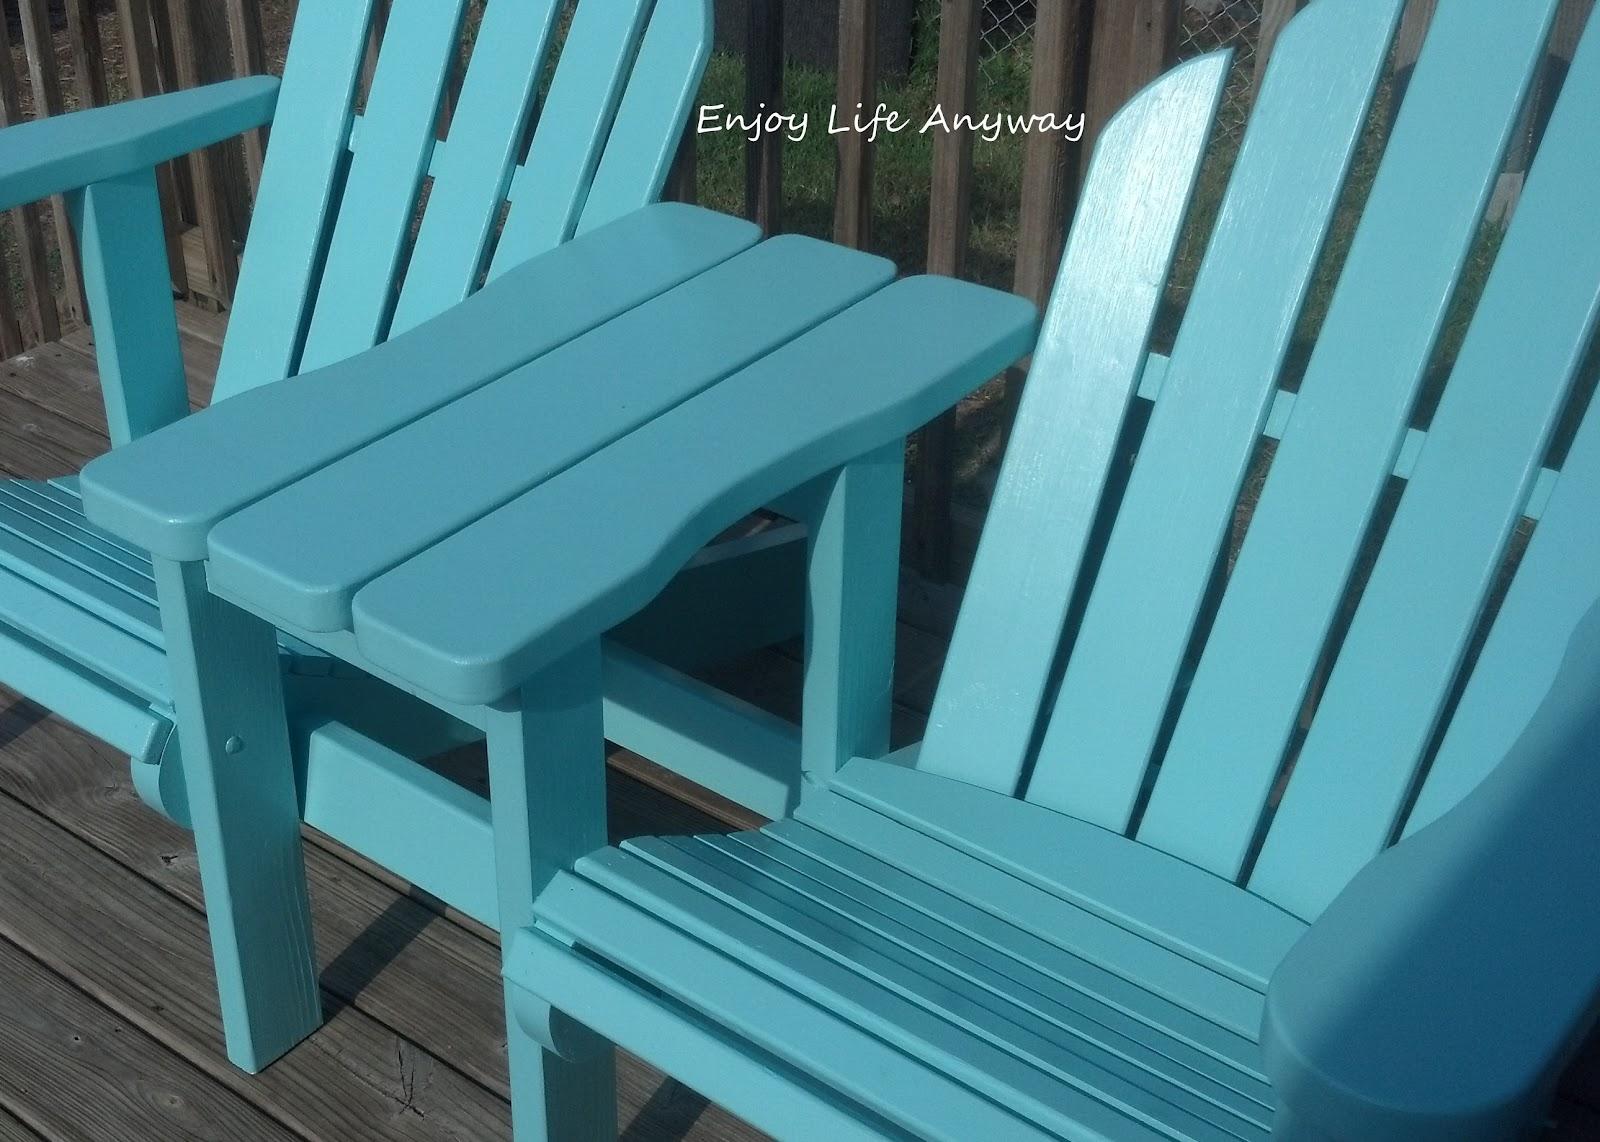 Diy Adirondack Chair Kit Covers Pillowcase Enjoy Life Anyway Twin Chairs